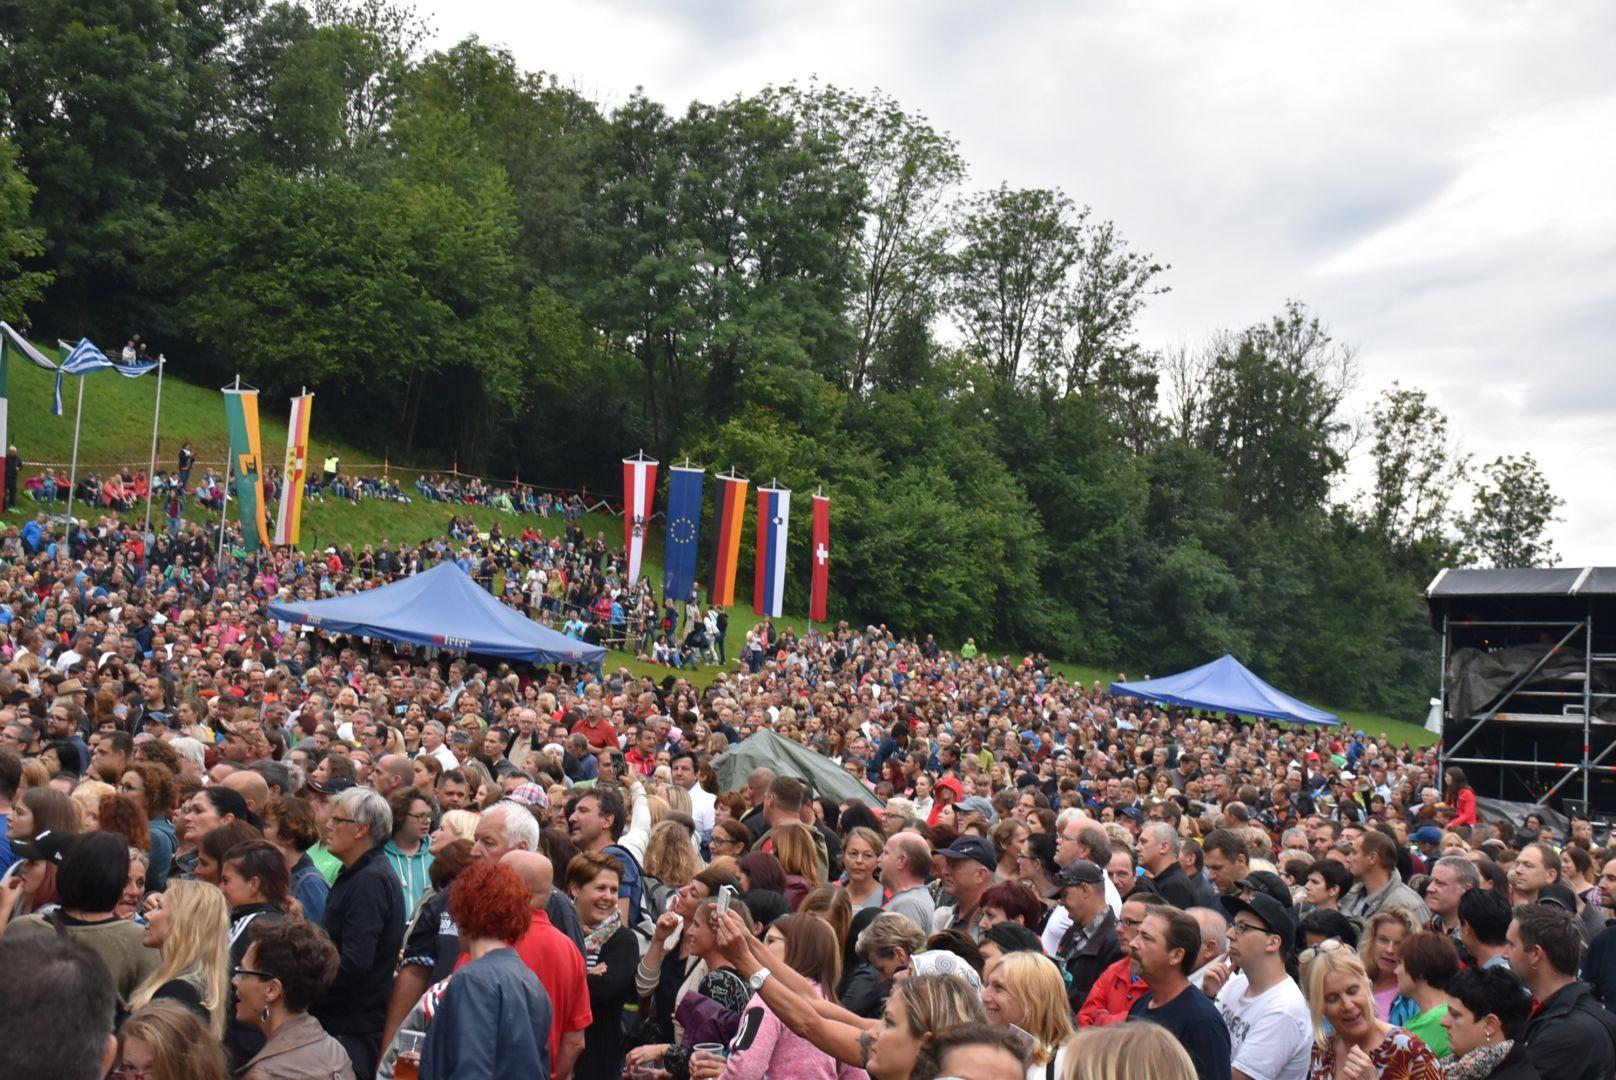 Sexdating Moosburg Moosburg - Sex treffen Graz Geidorf